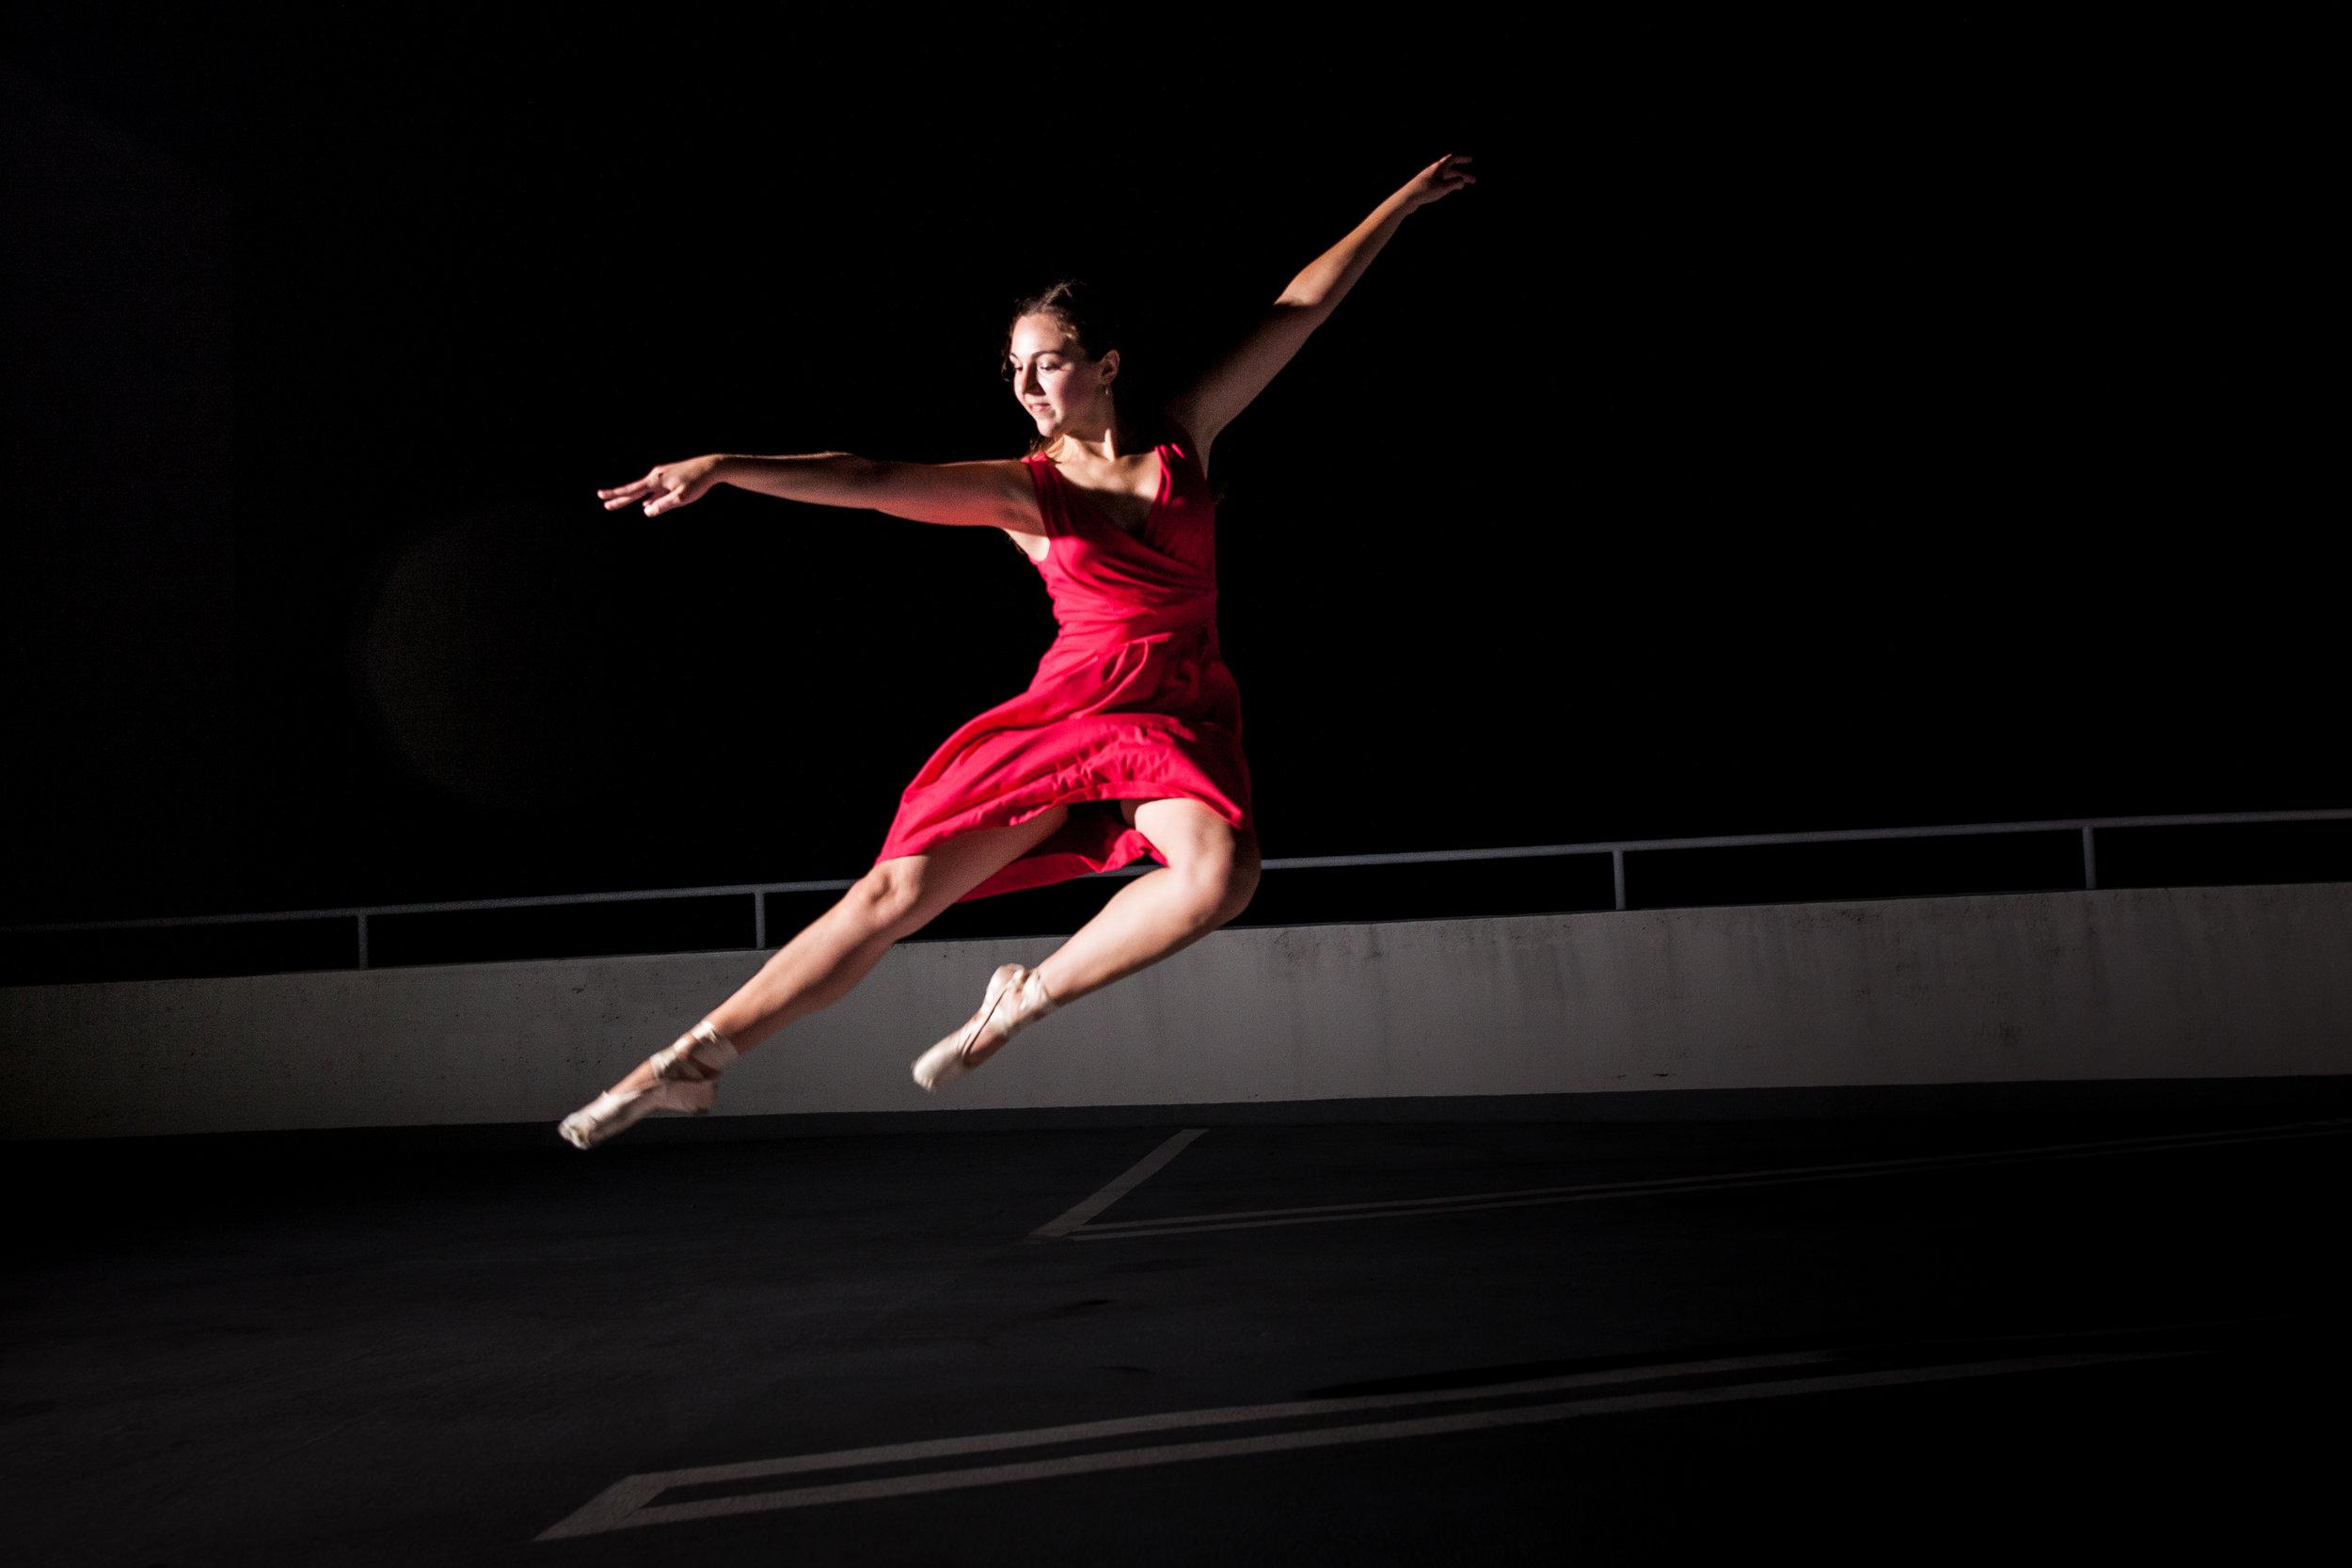 2016_07_28_anne_talkington_durham_dances_ballet_corcoran-281.jpg